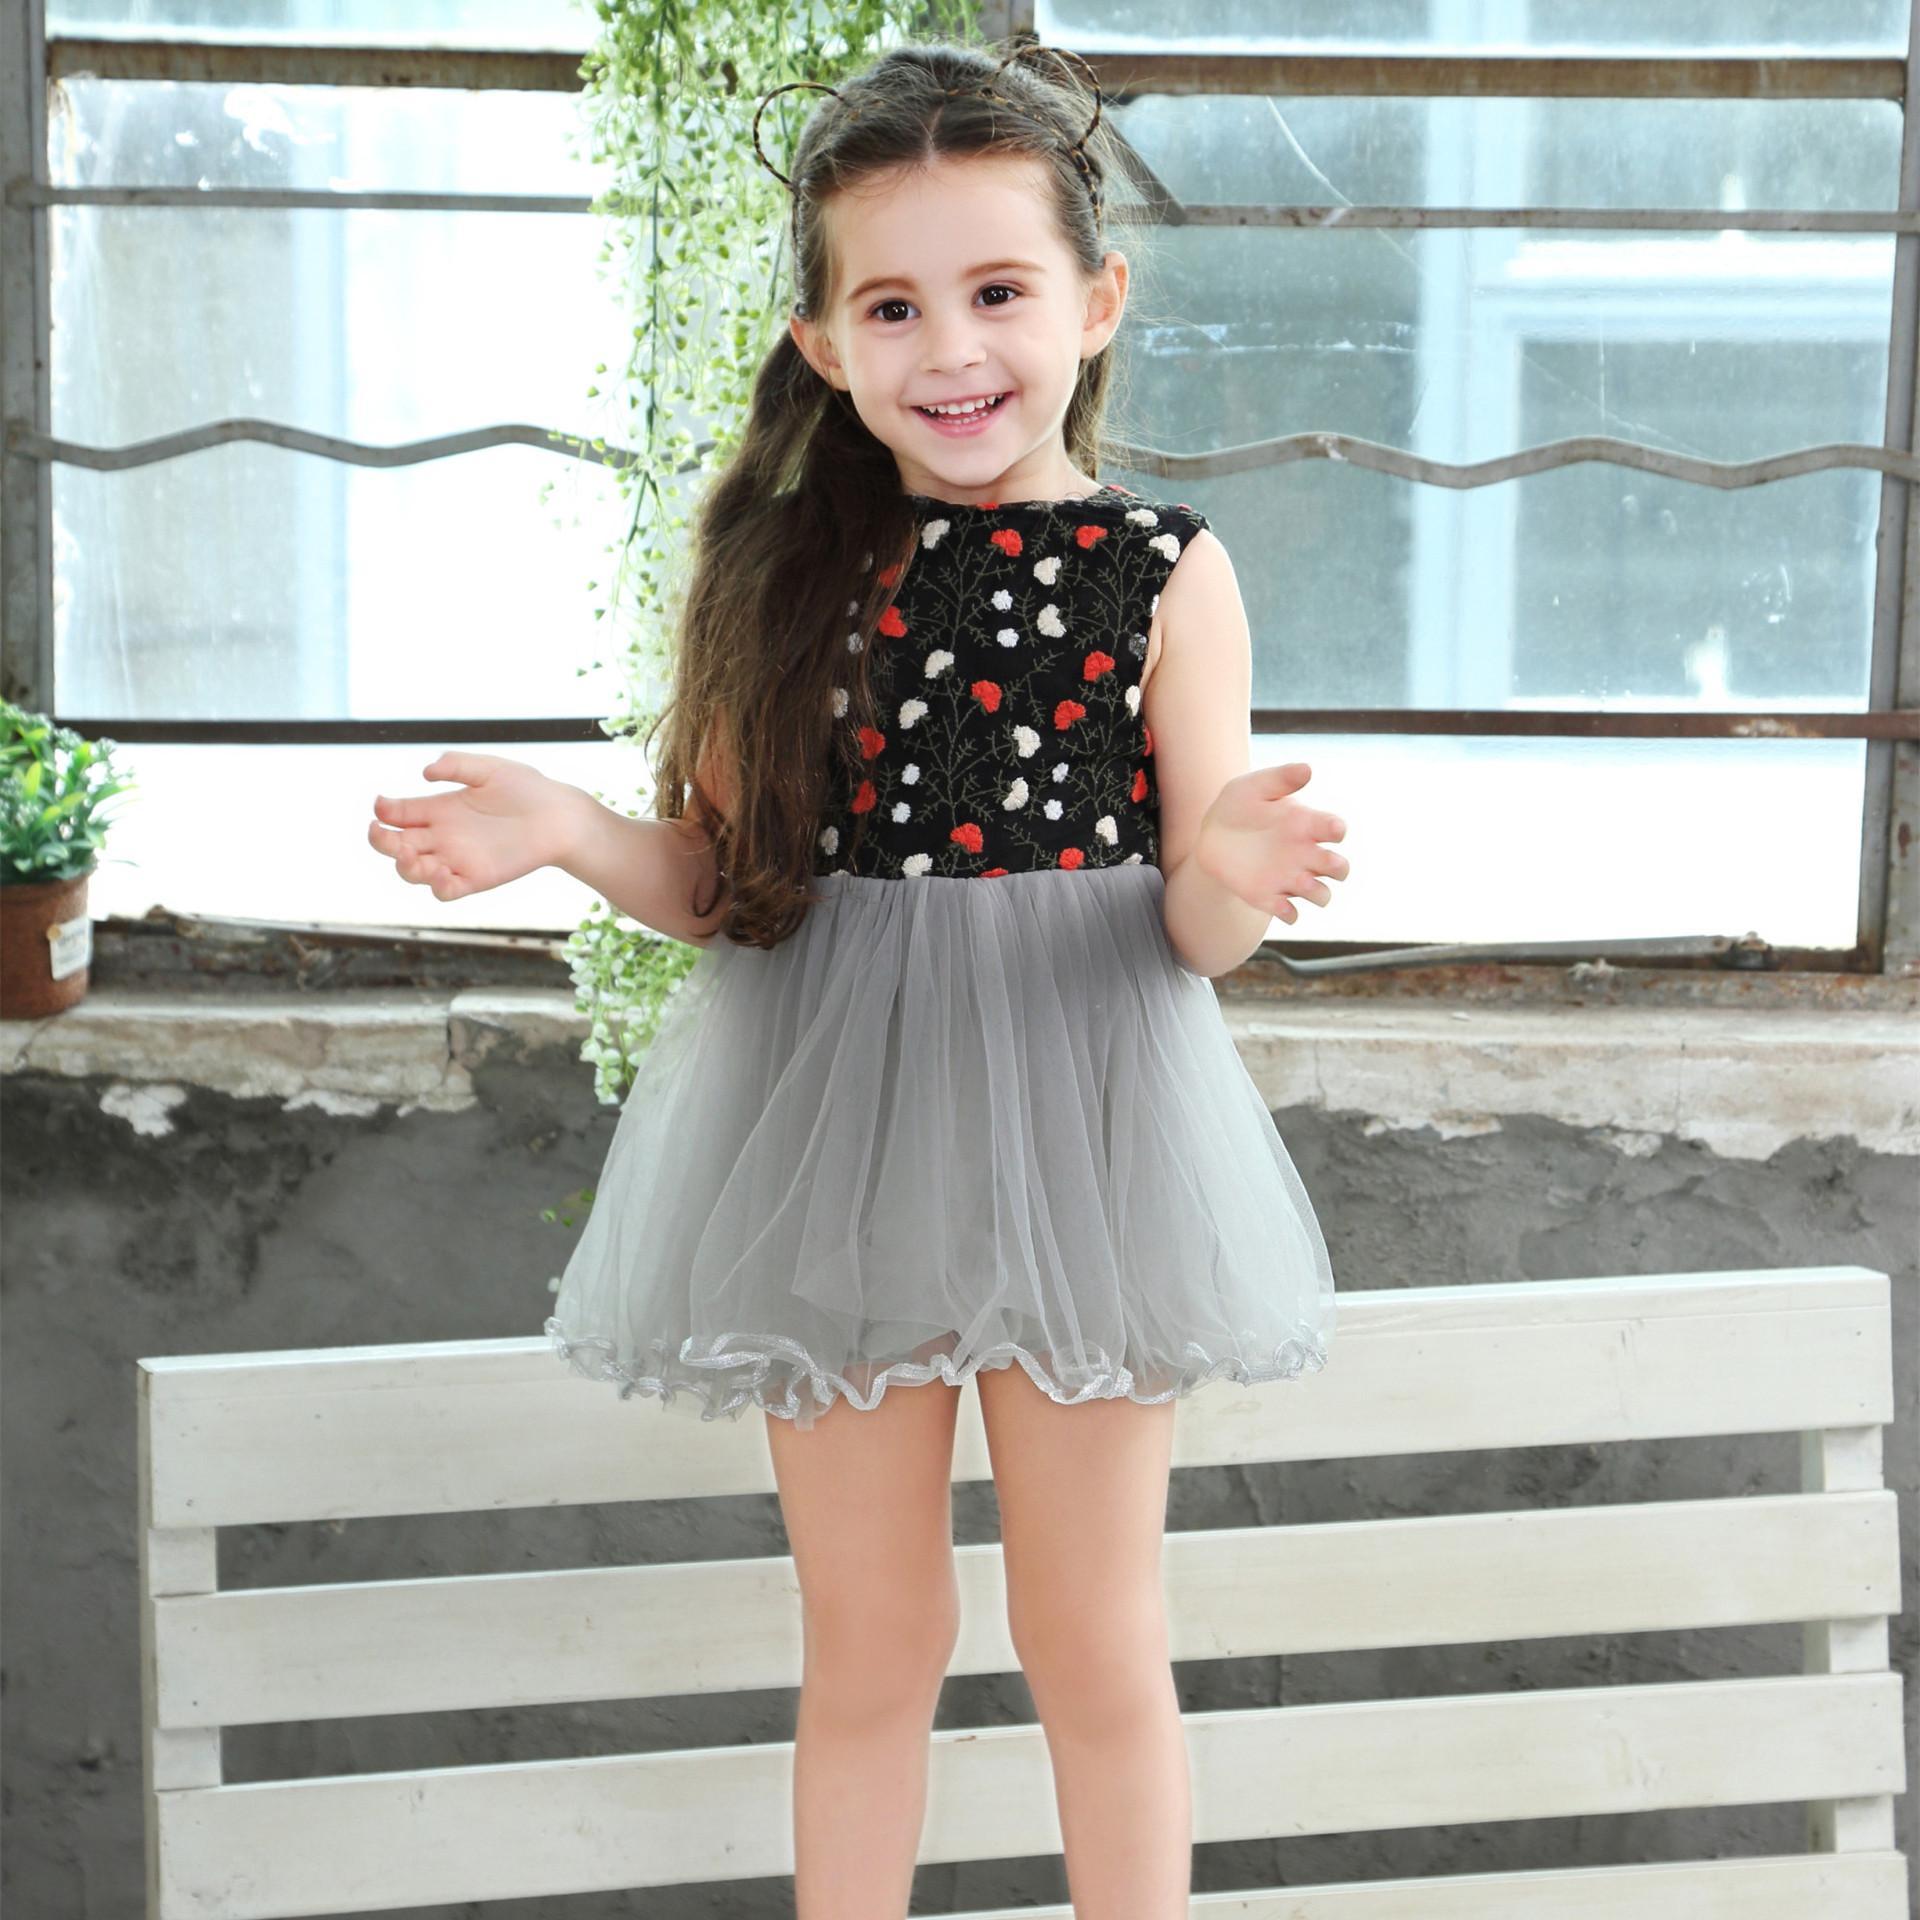 2018 Summer 2018 New Girls Embroidery Dress Girl Fashion Dresses V